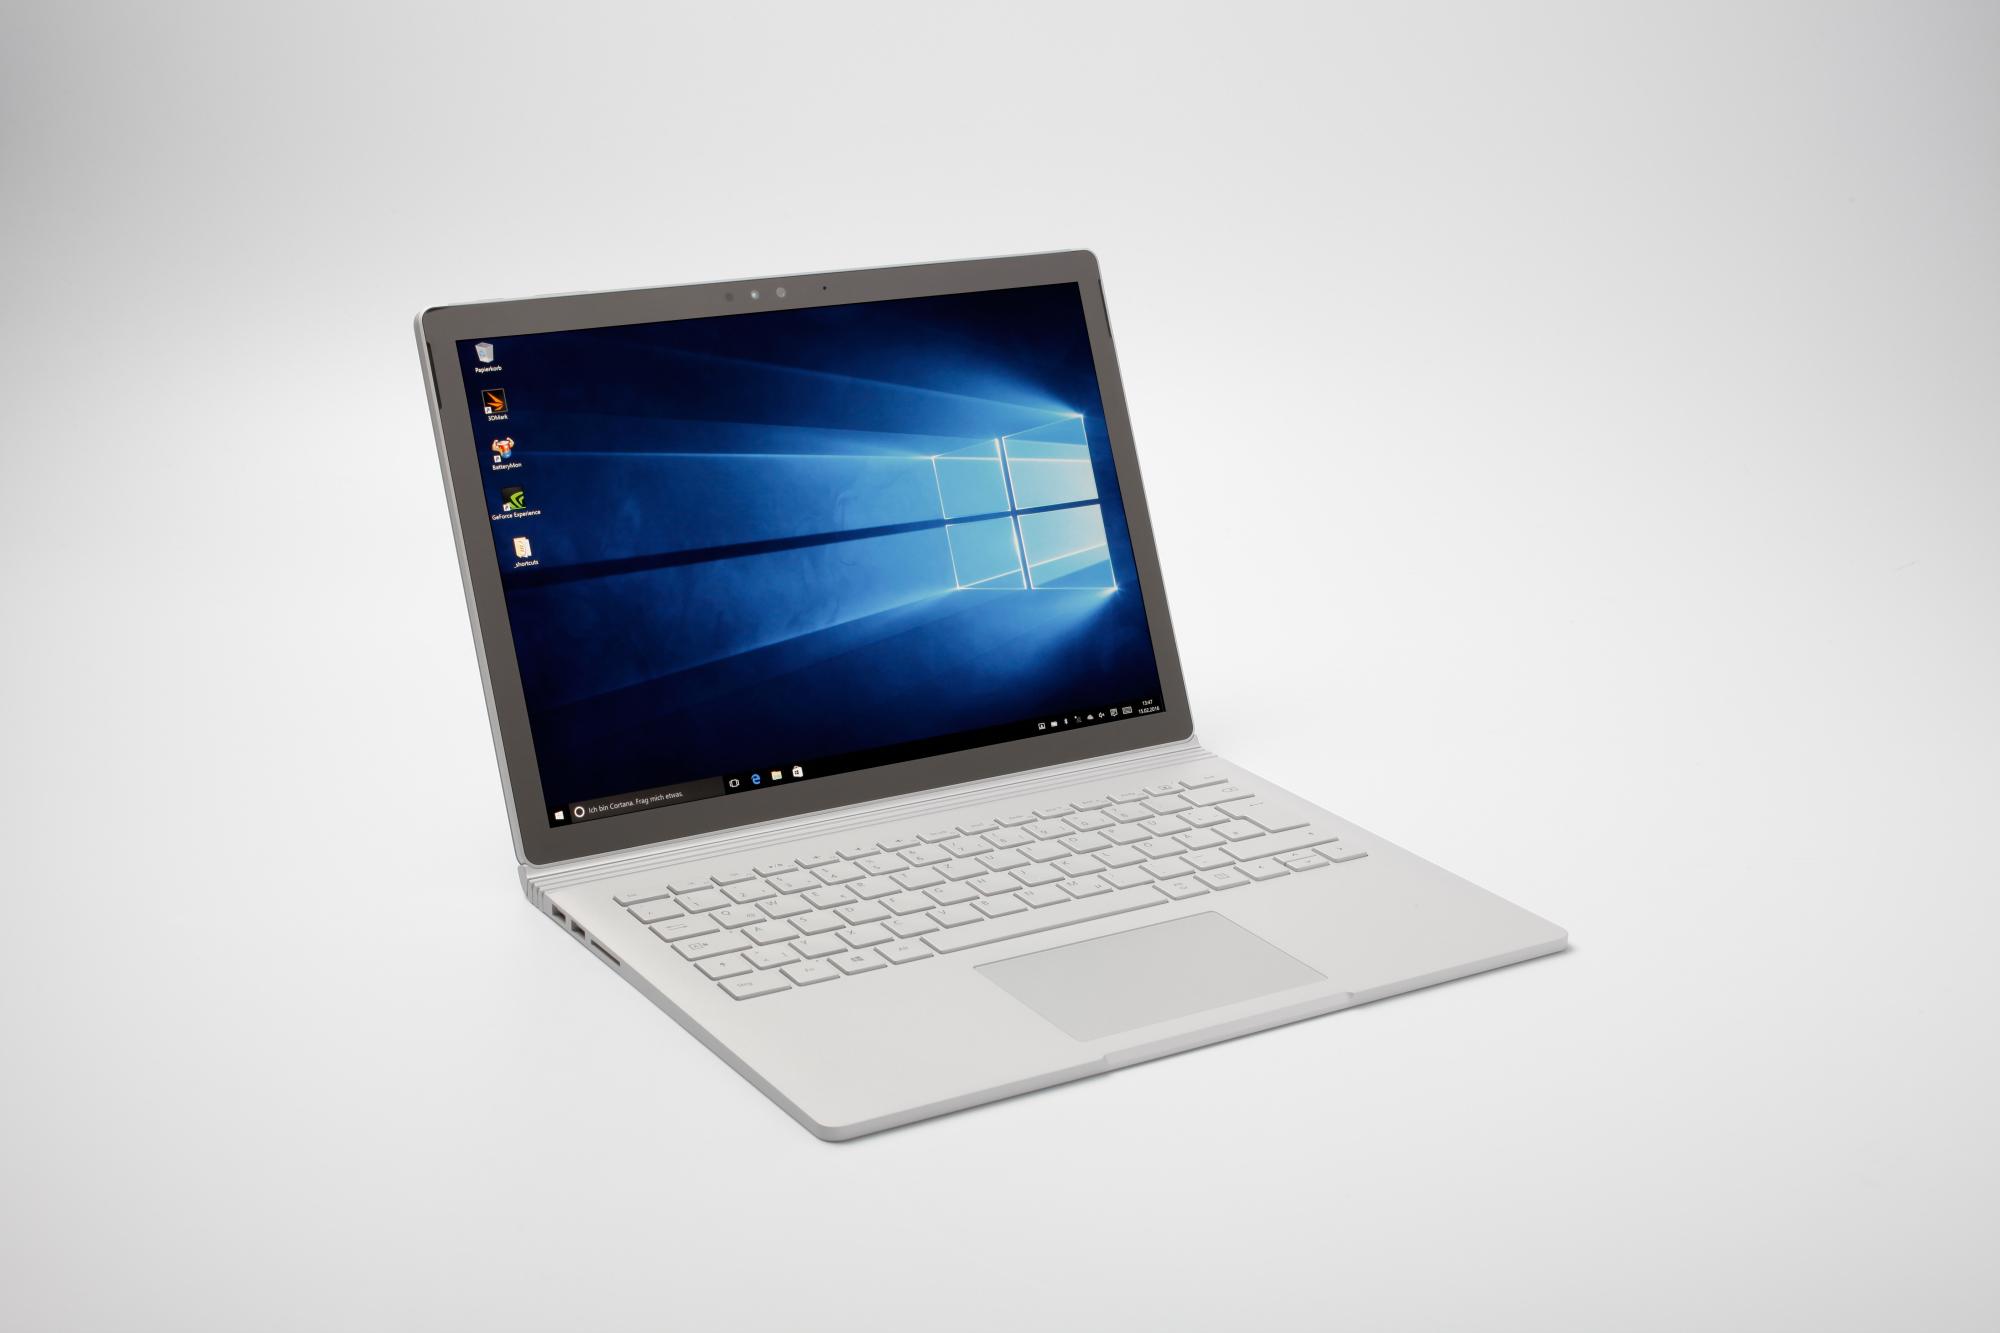 Microsoft Surface Book Edel Laptop Und Windows Tablet In